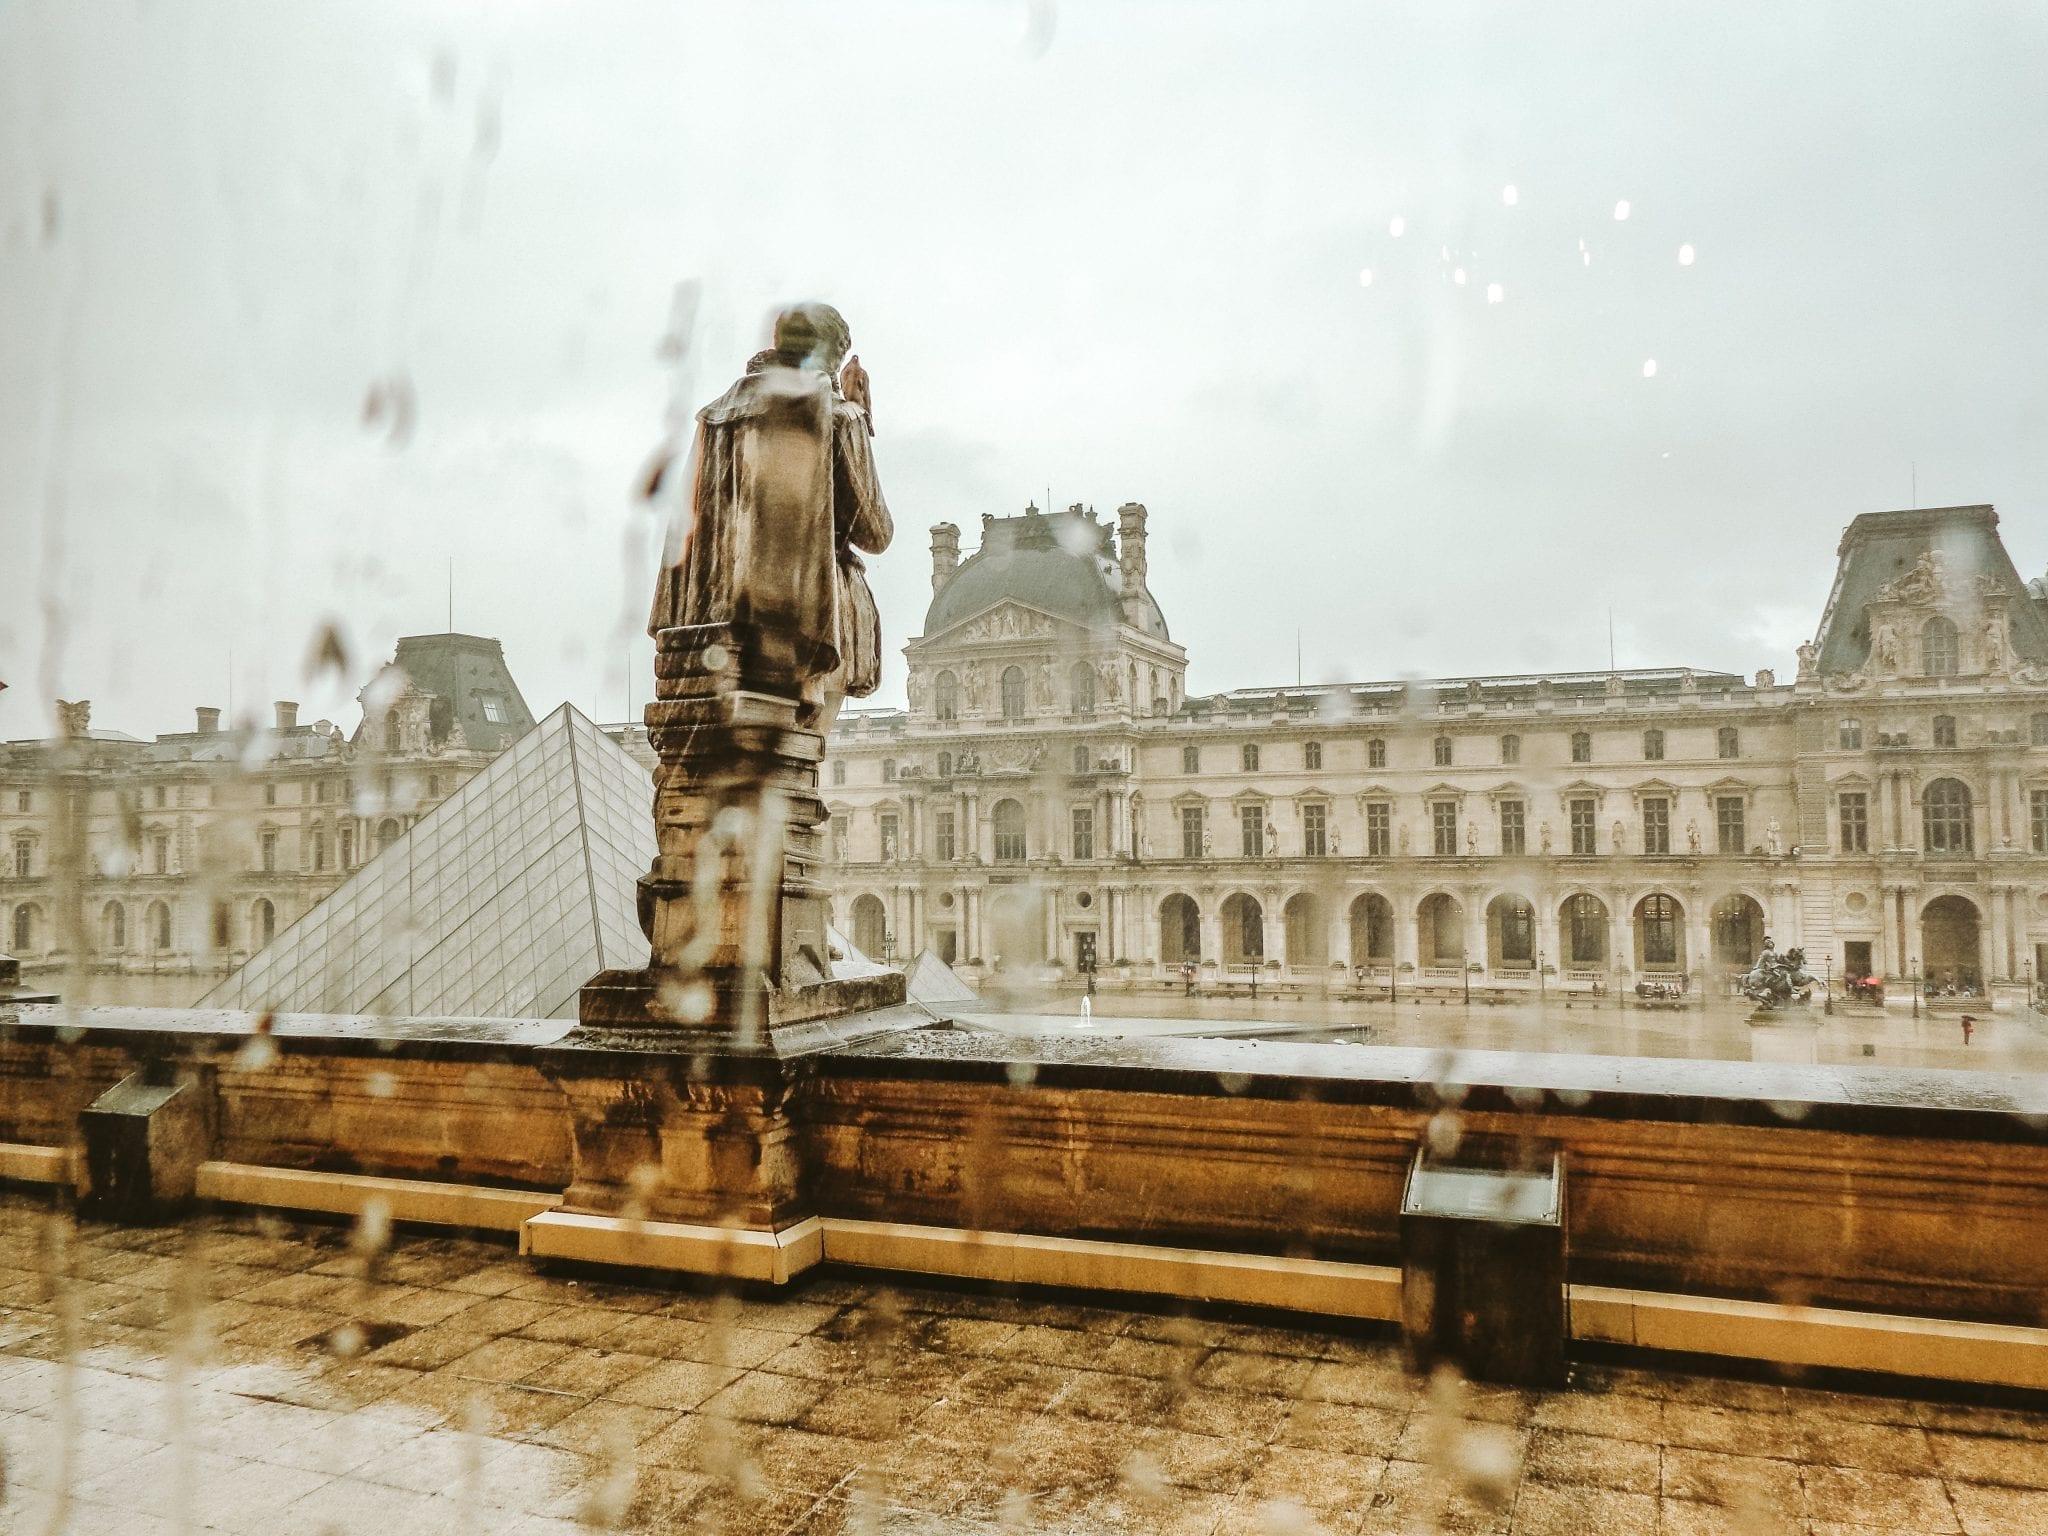 paris louvre Pack Light for Europe in Summer